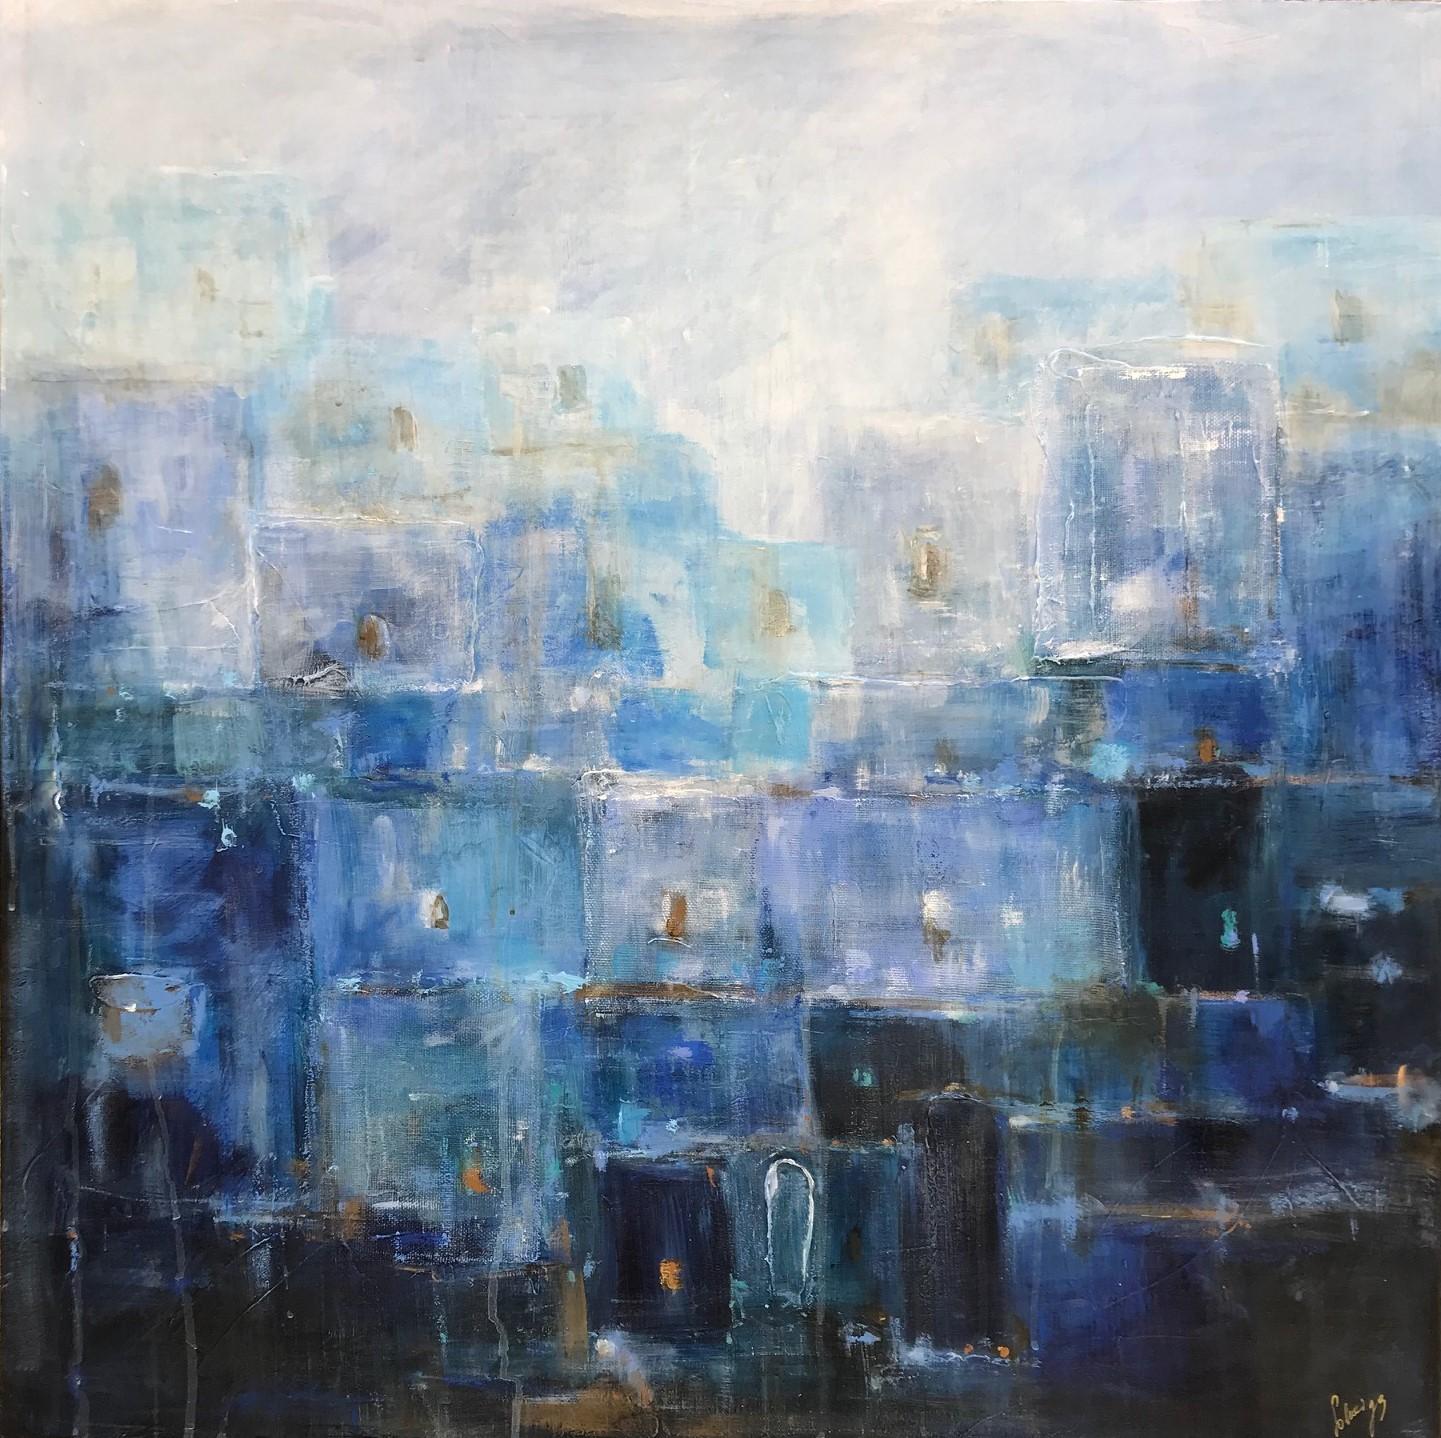 Blue city in Morocoo (painting galerie art robert deniau mougins)